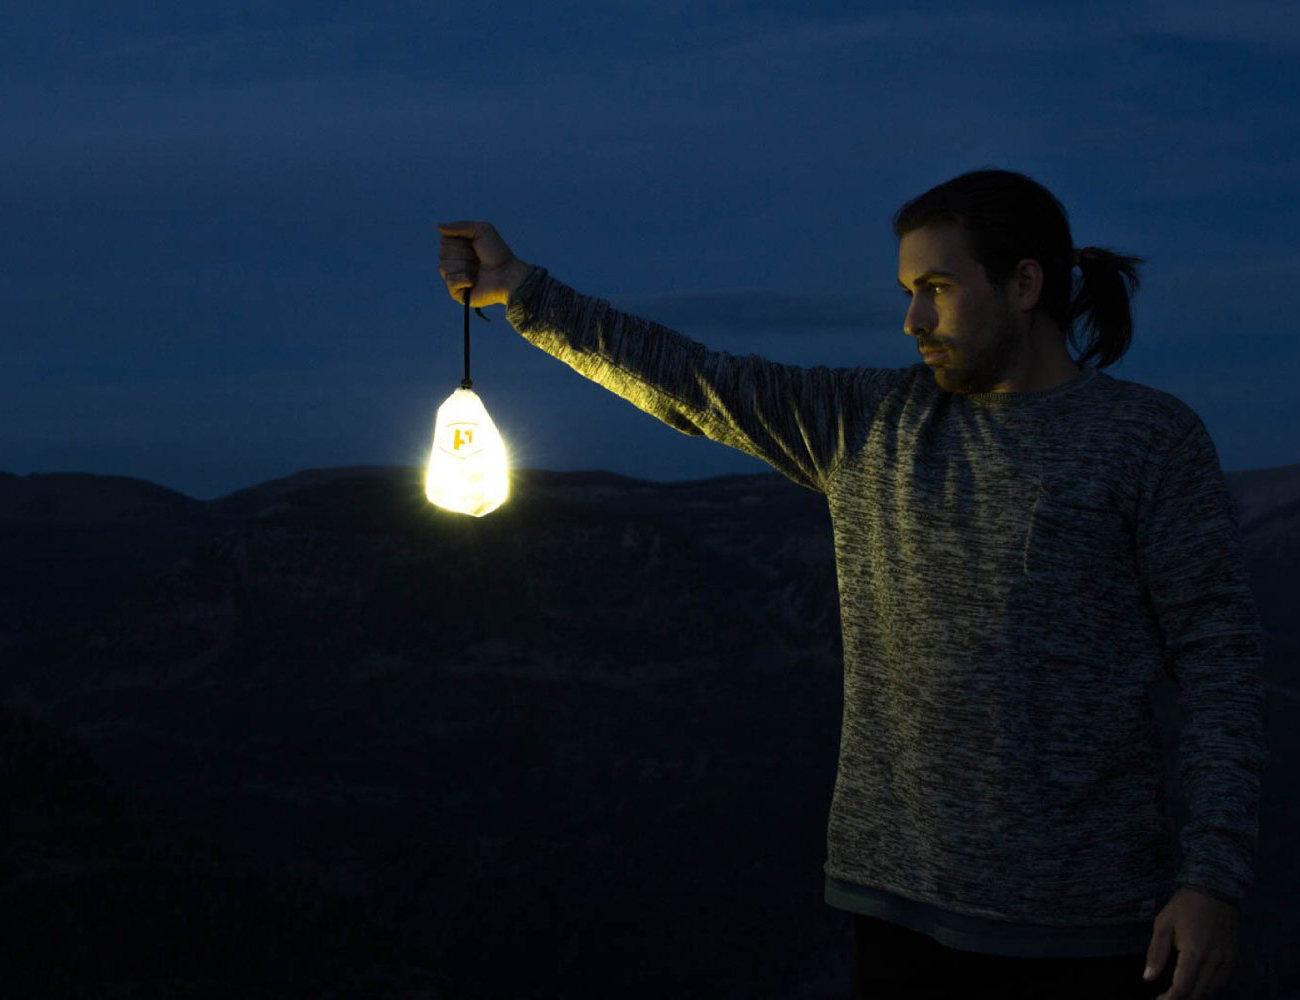 Luminoodle – The Flexible Waterproof USB LED Strip